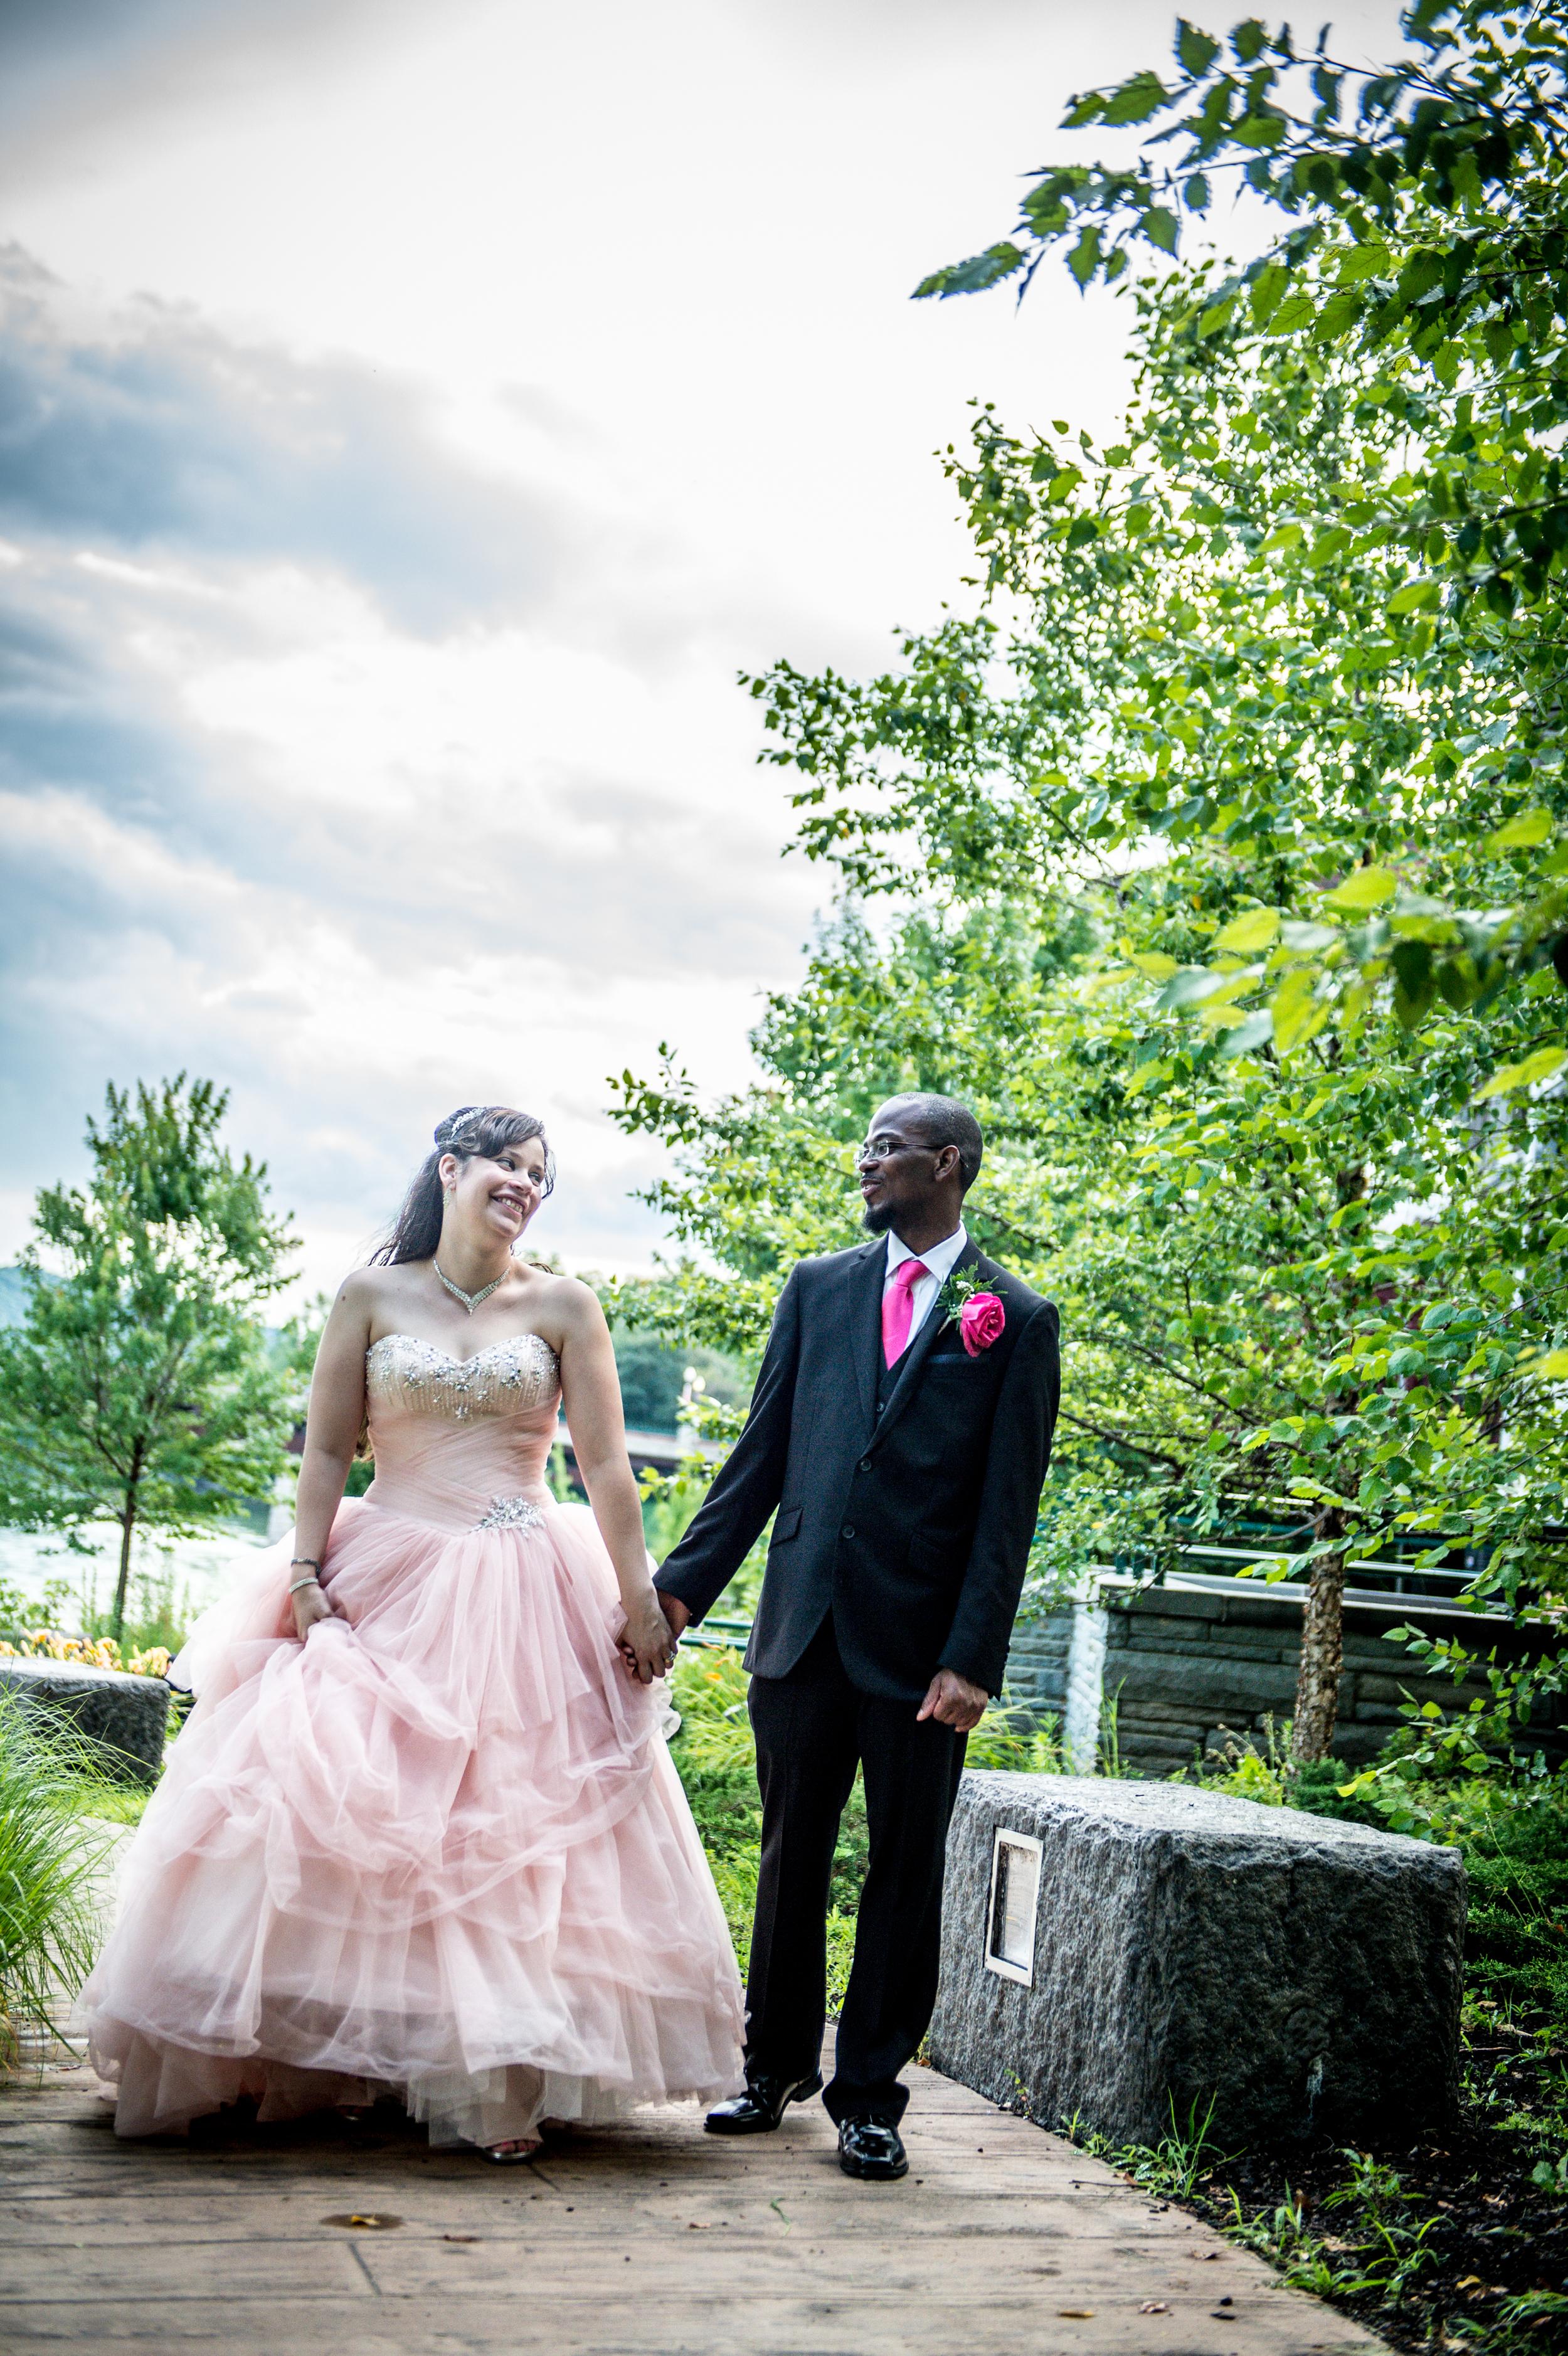 Hudlin Wedding_FULL - 0326.jpg